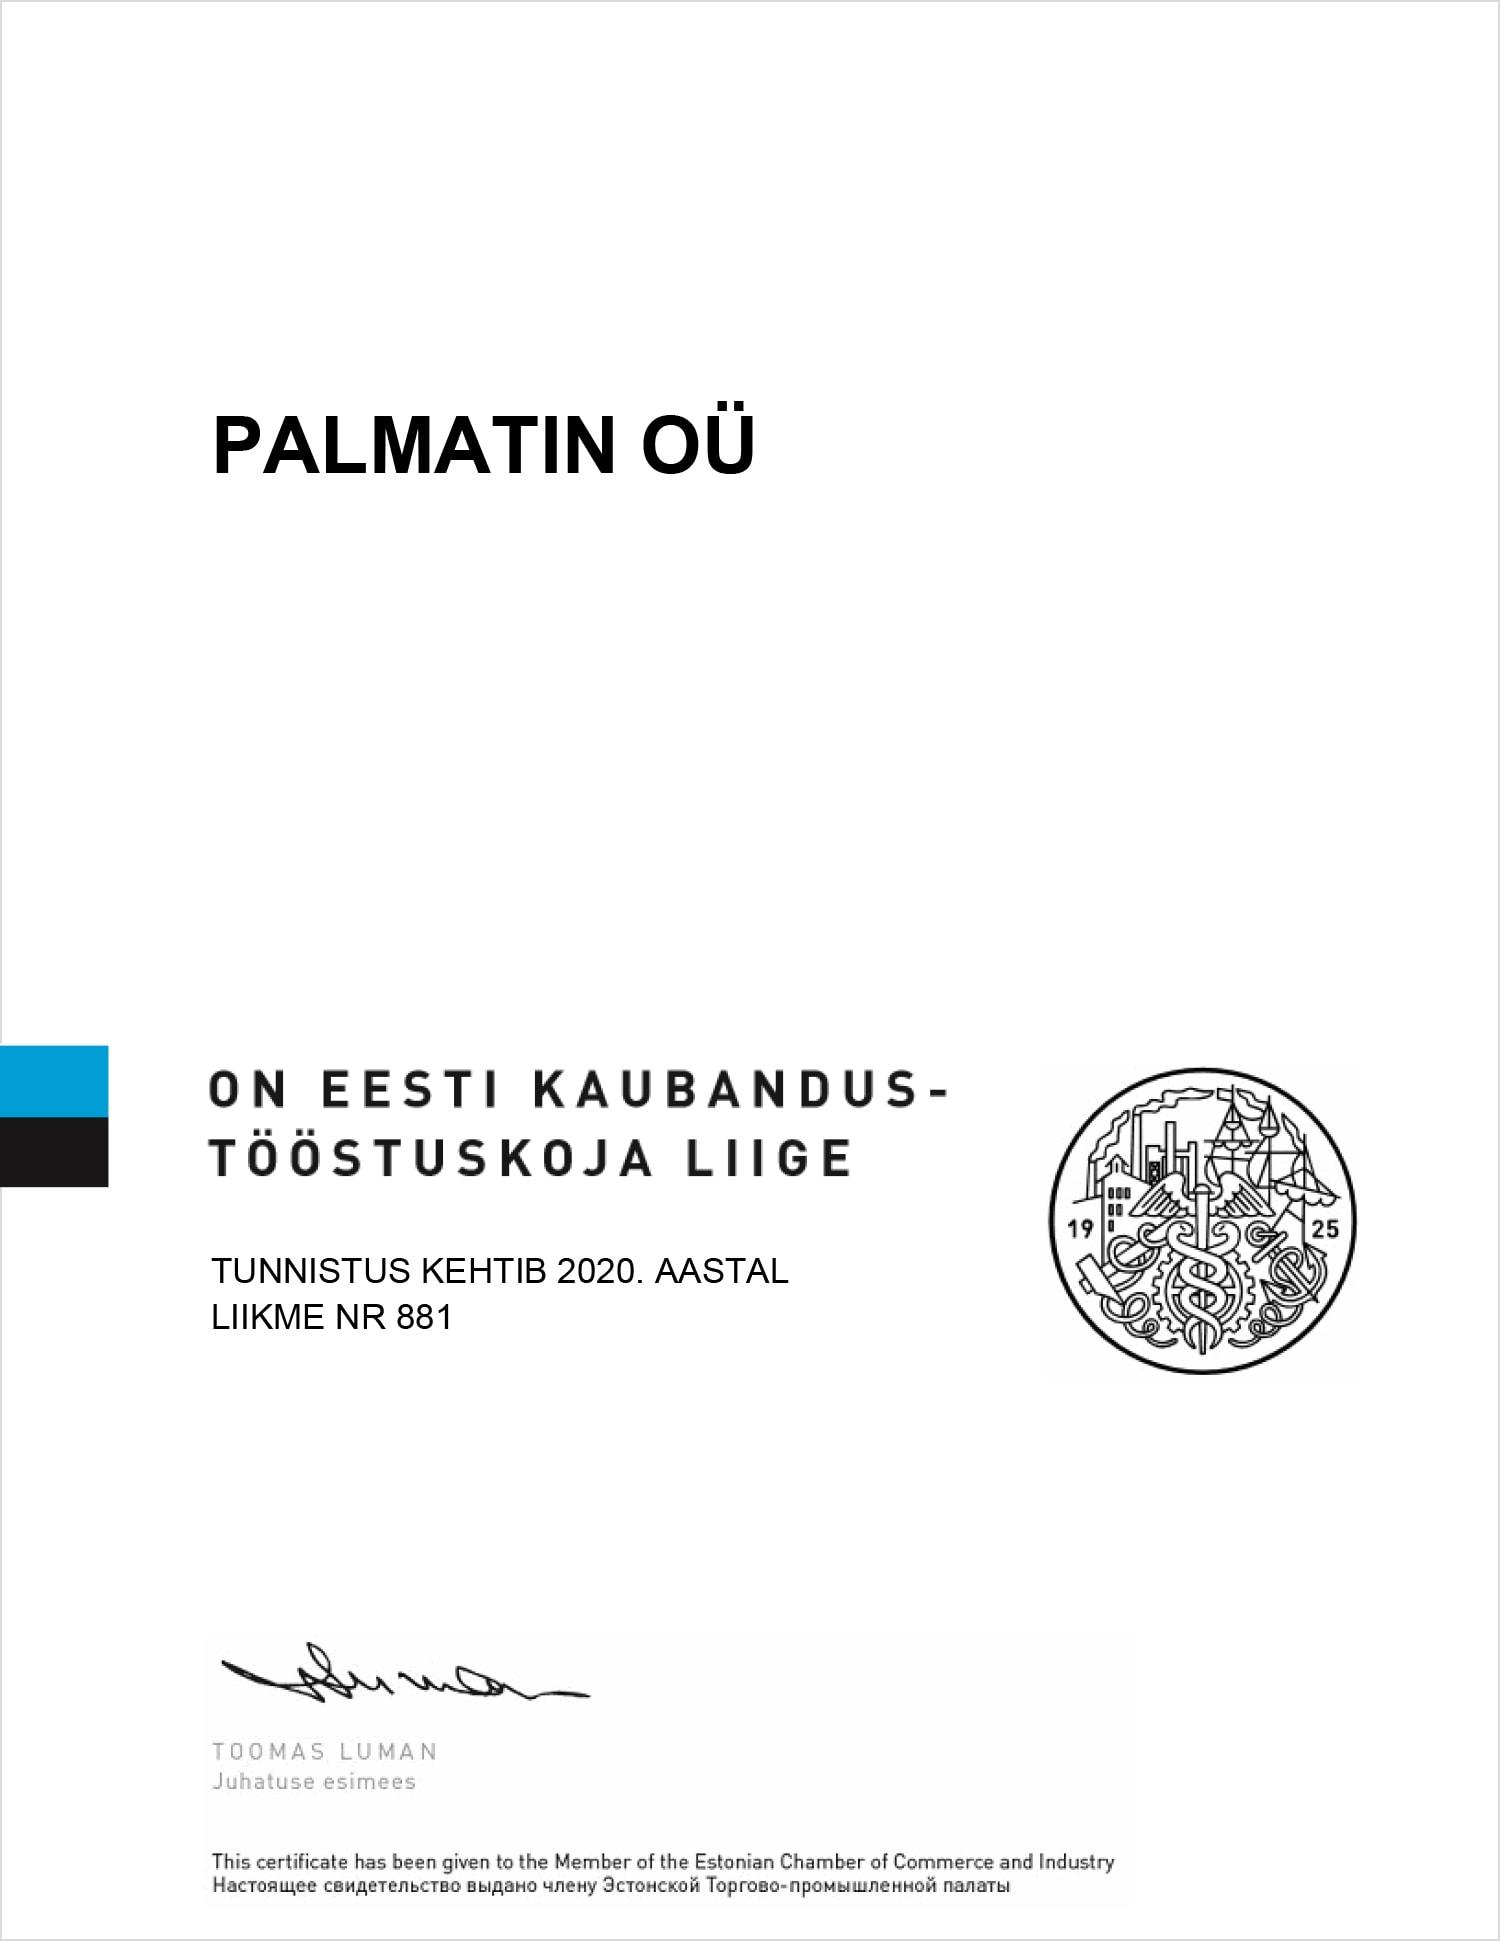 Certificate-PALMATIN-20200214-873